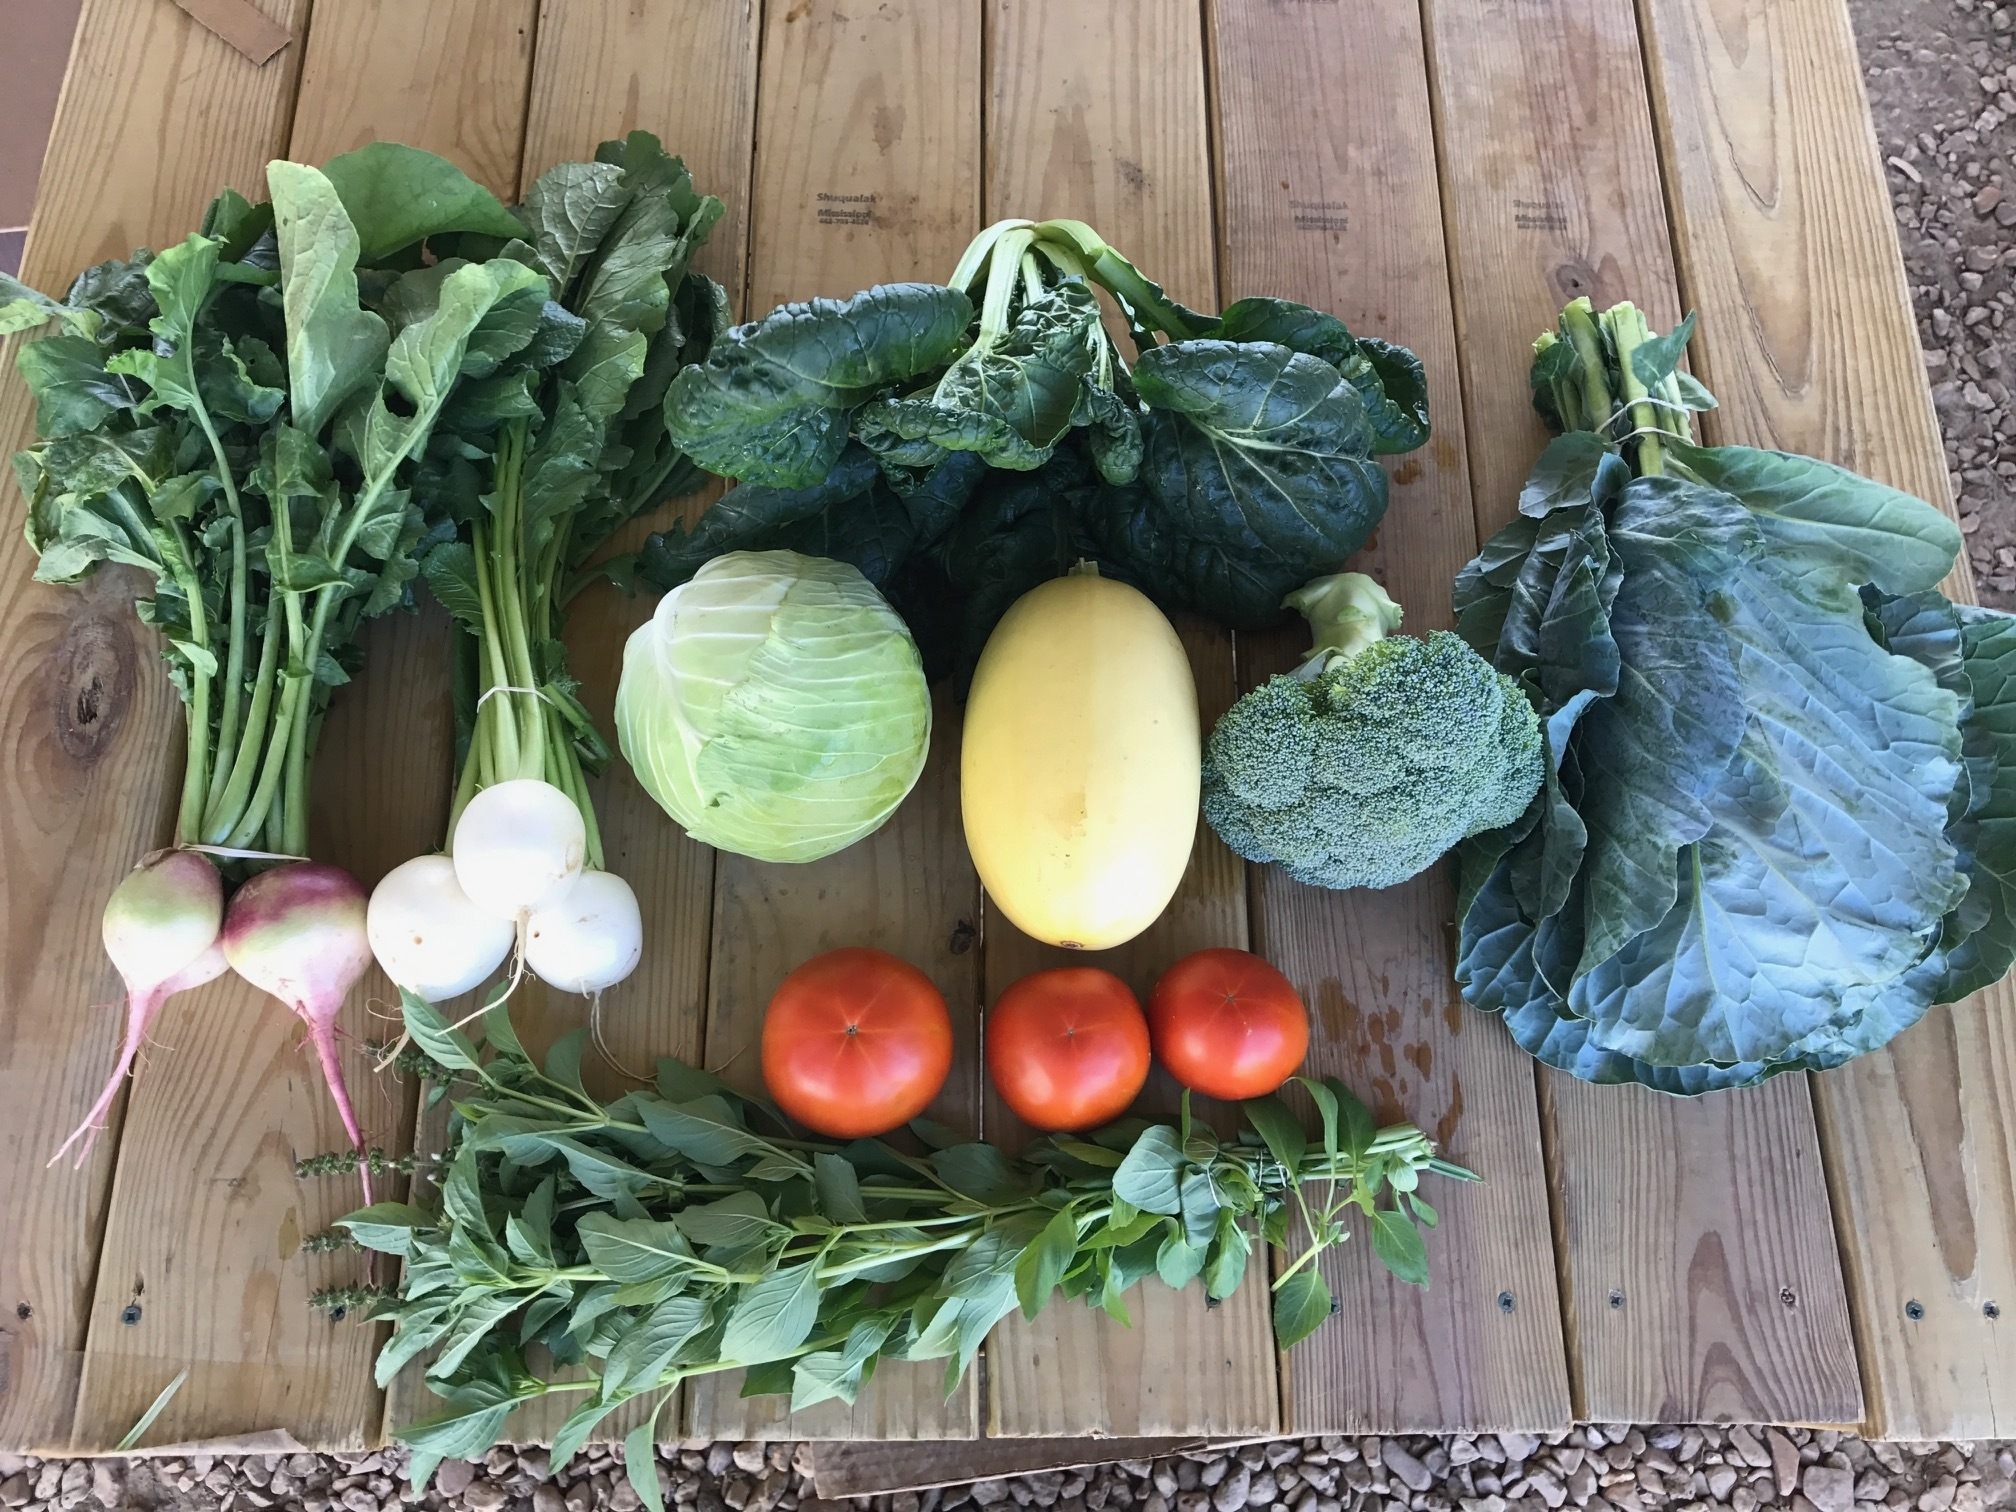 Top left: Watermelon radish, Hakurei turnip, Yukina Savoy, below the Yukina from left to right: green cabbage, Spaghetti squash, broccoli, and collard greens. Below tomatoes and then lemon basil.